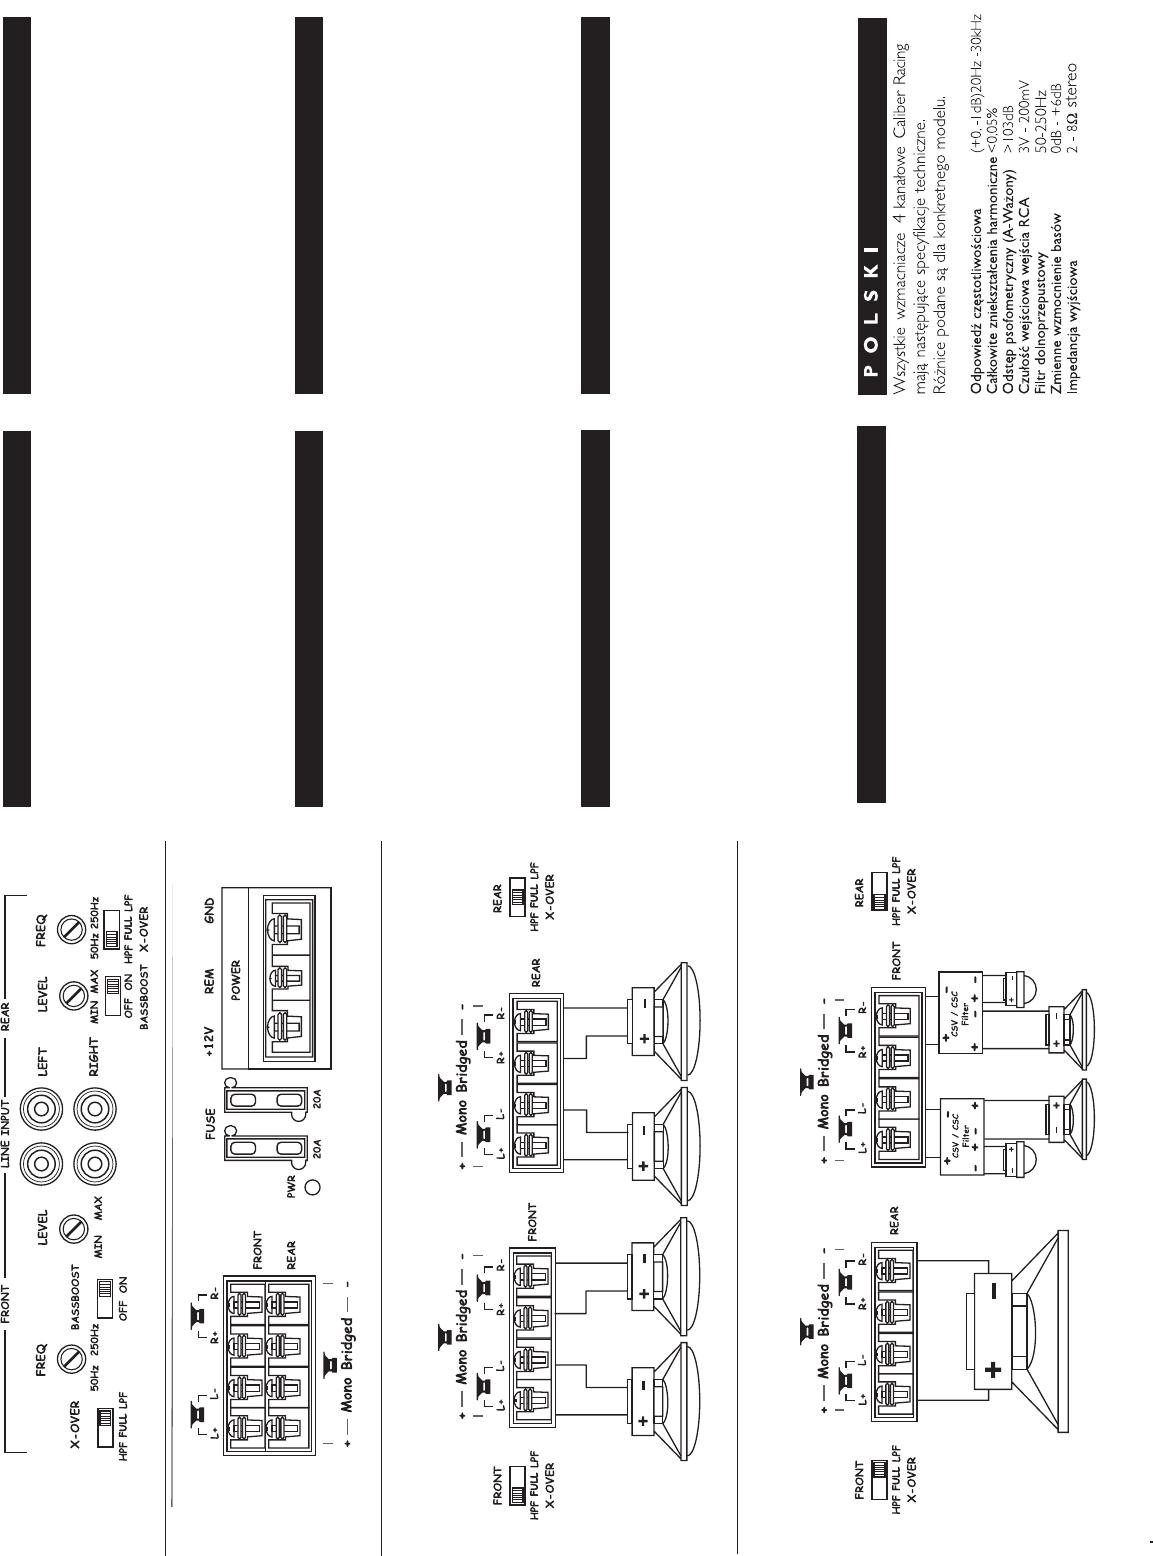 Handleiding Caliber ca 504 n (pagina 2 van 12) (Deutsch, English ...